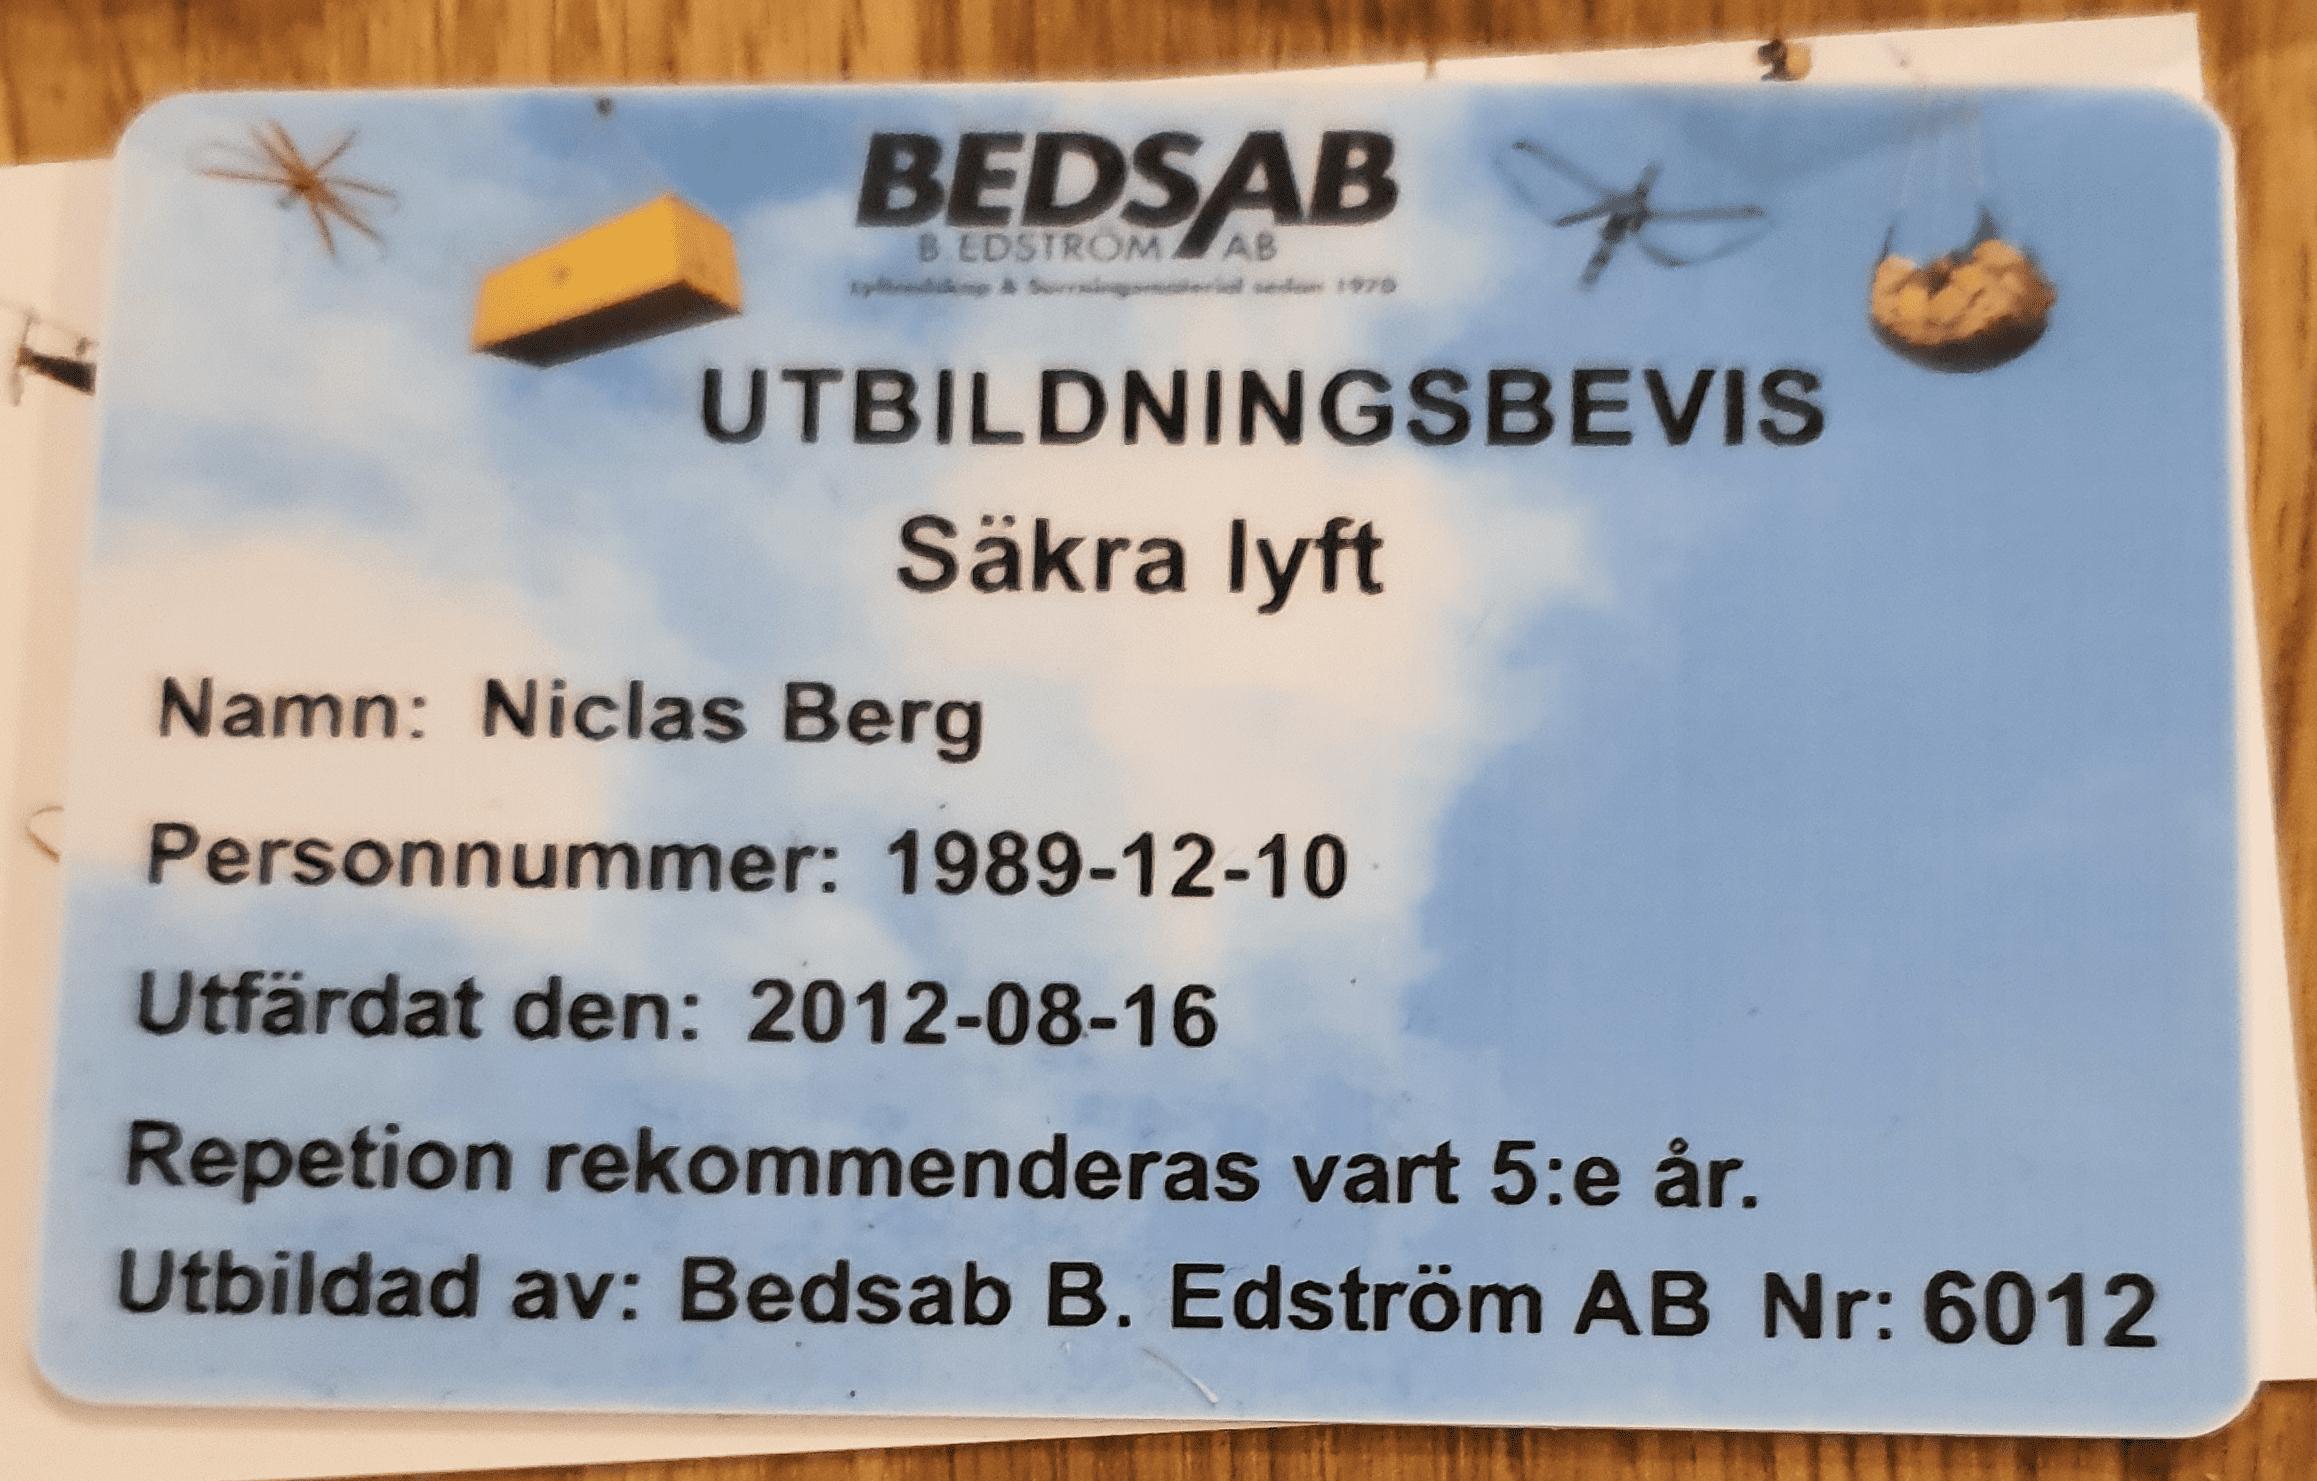 "Referensjobb """" utfört av Svenska Bygglaget AB"